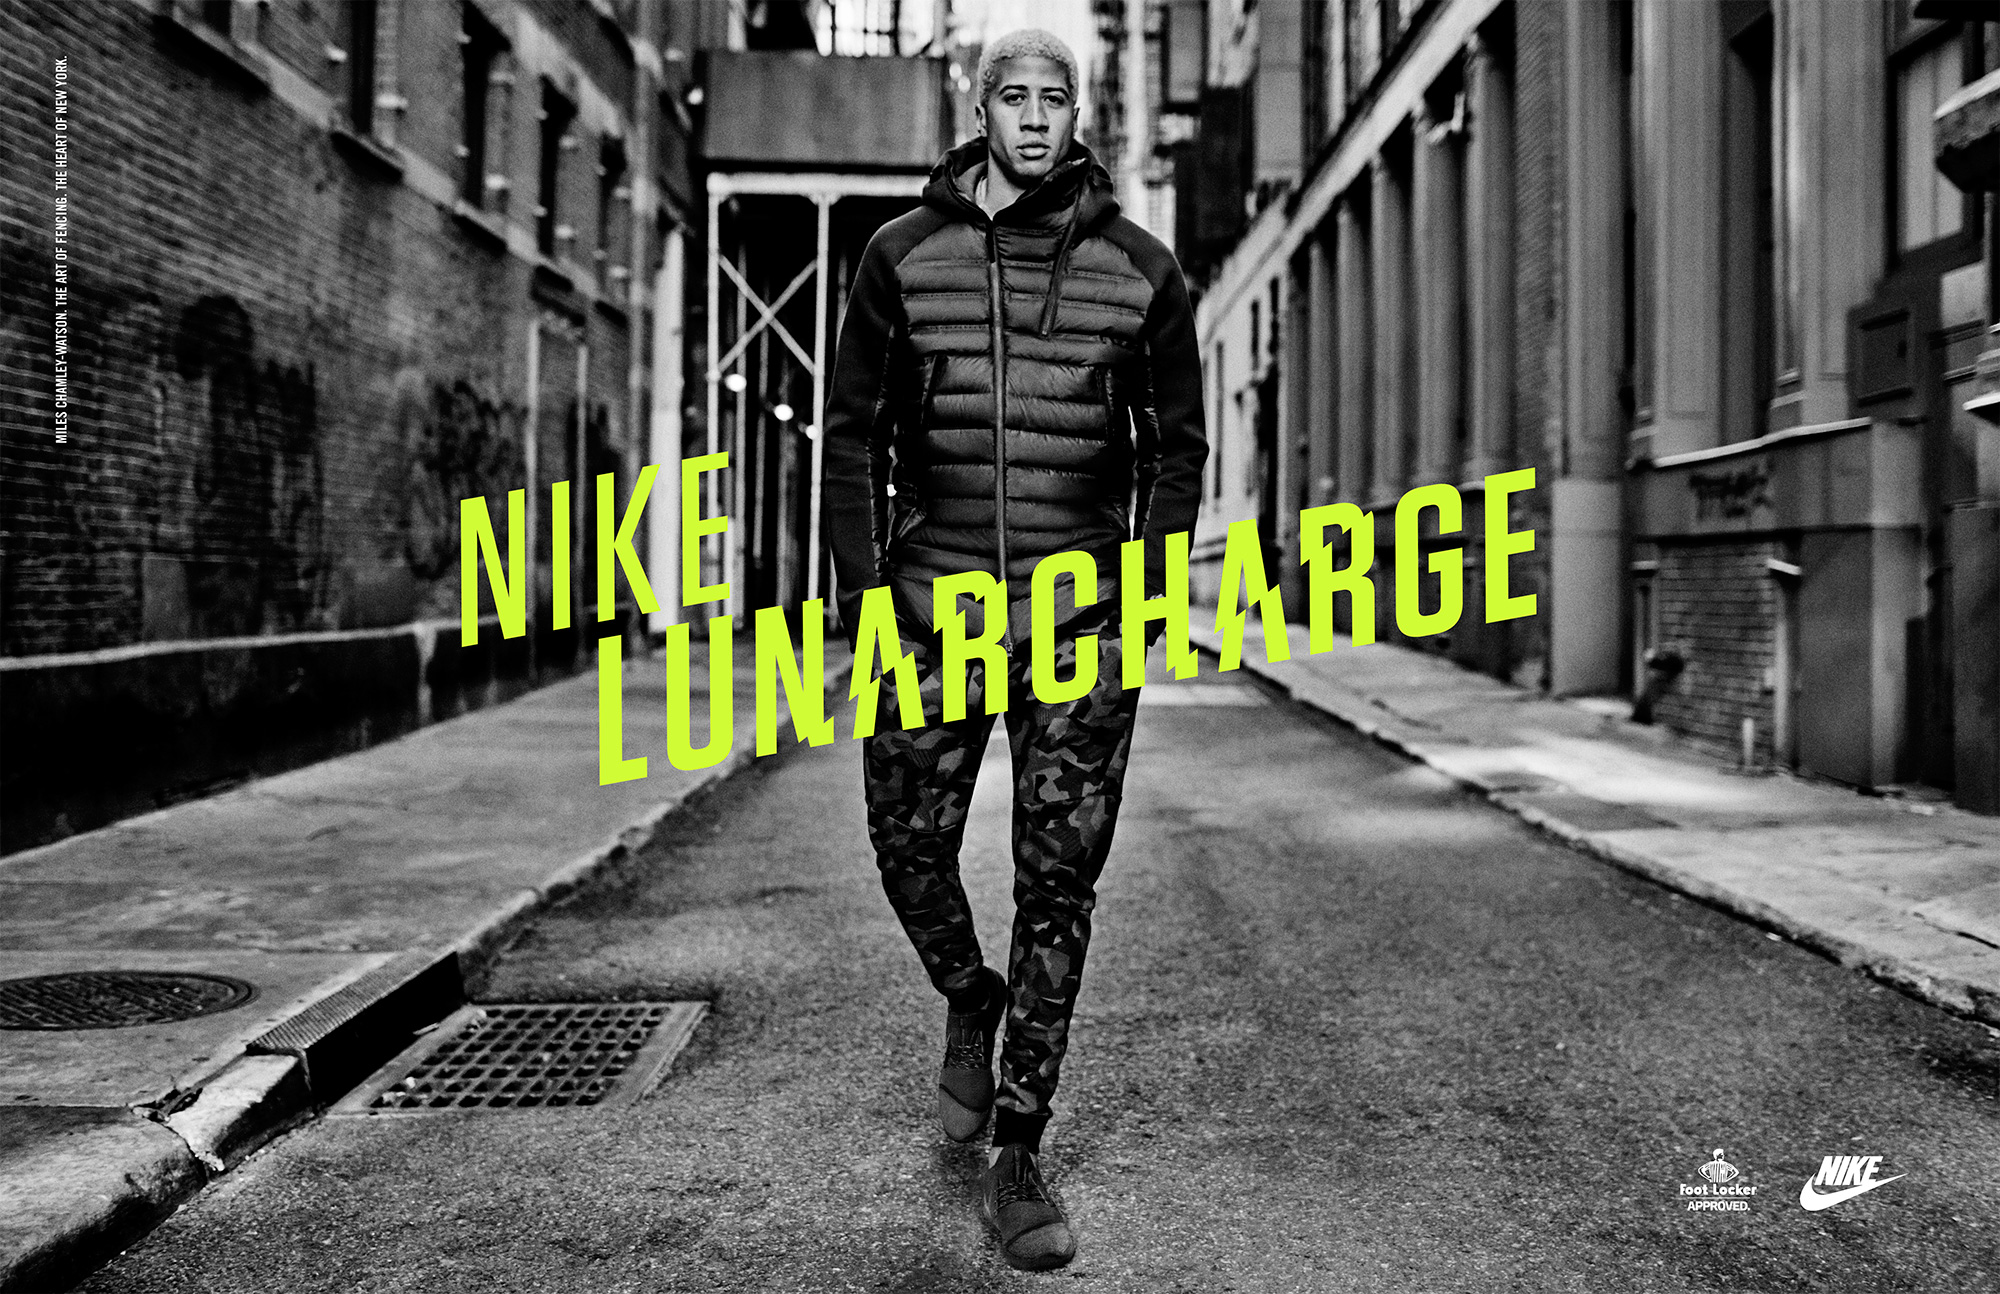 NYM_Lunarcharge_posters_horizontal_Miles.jpg